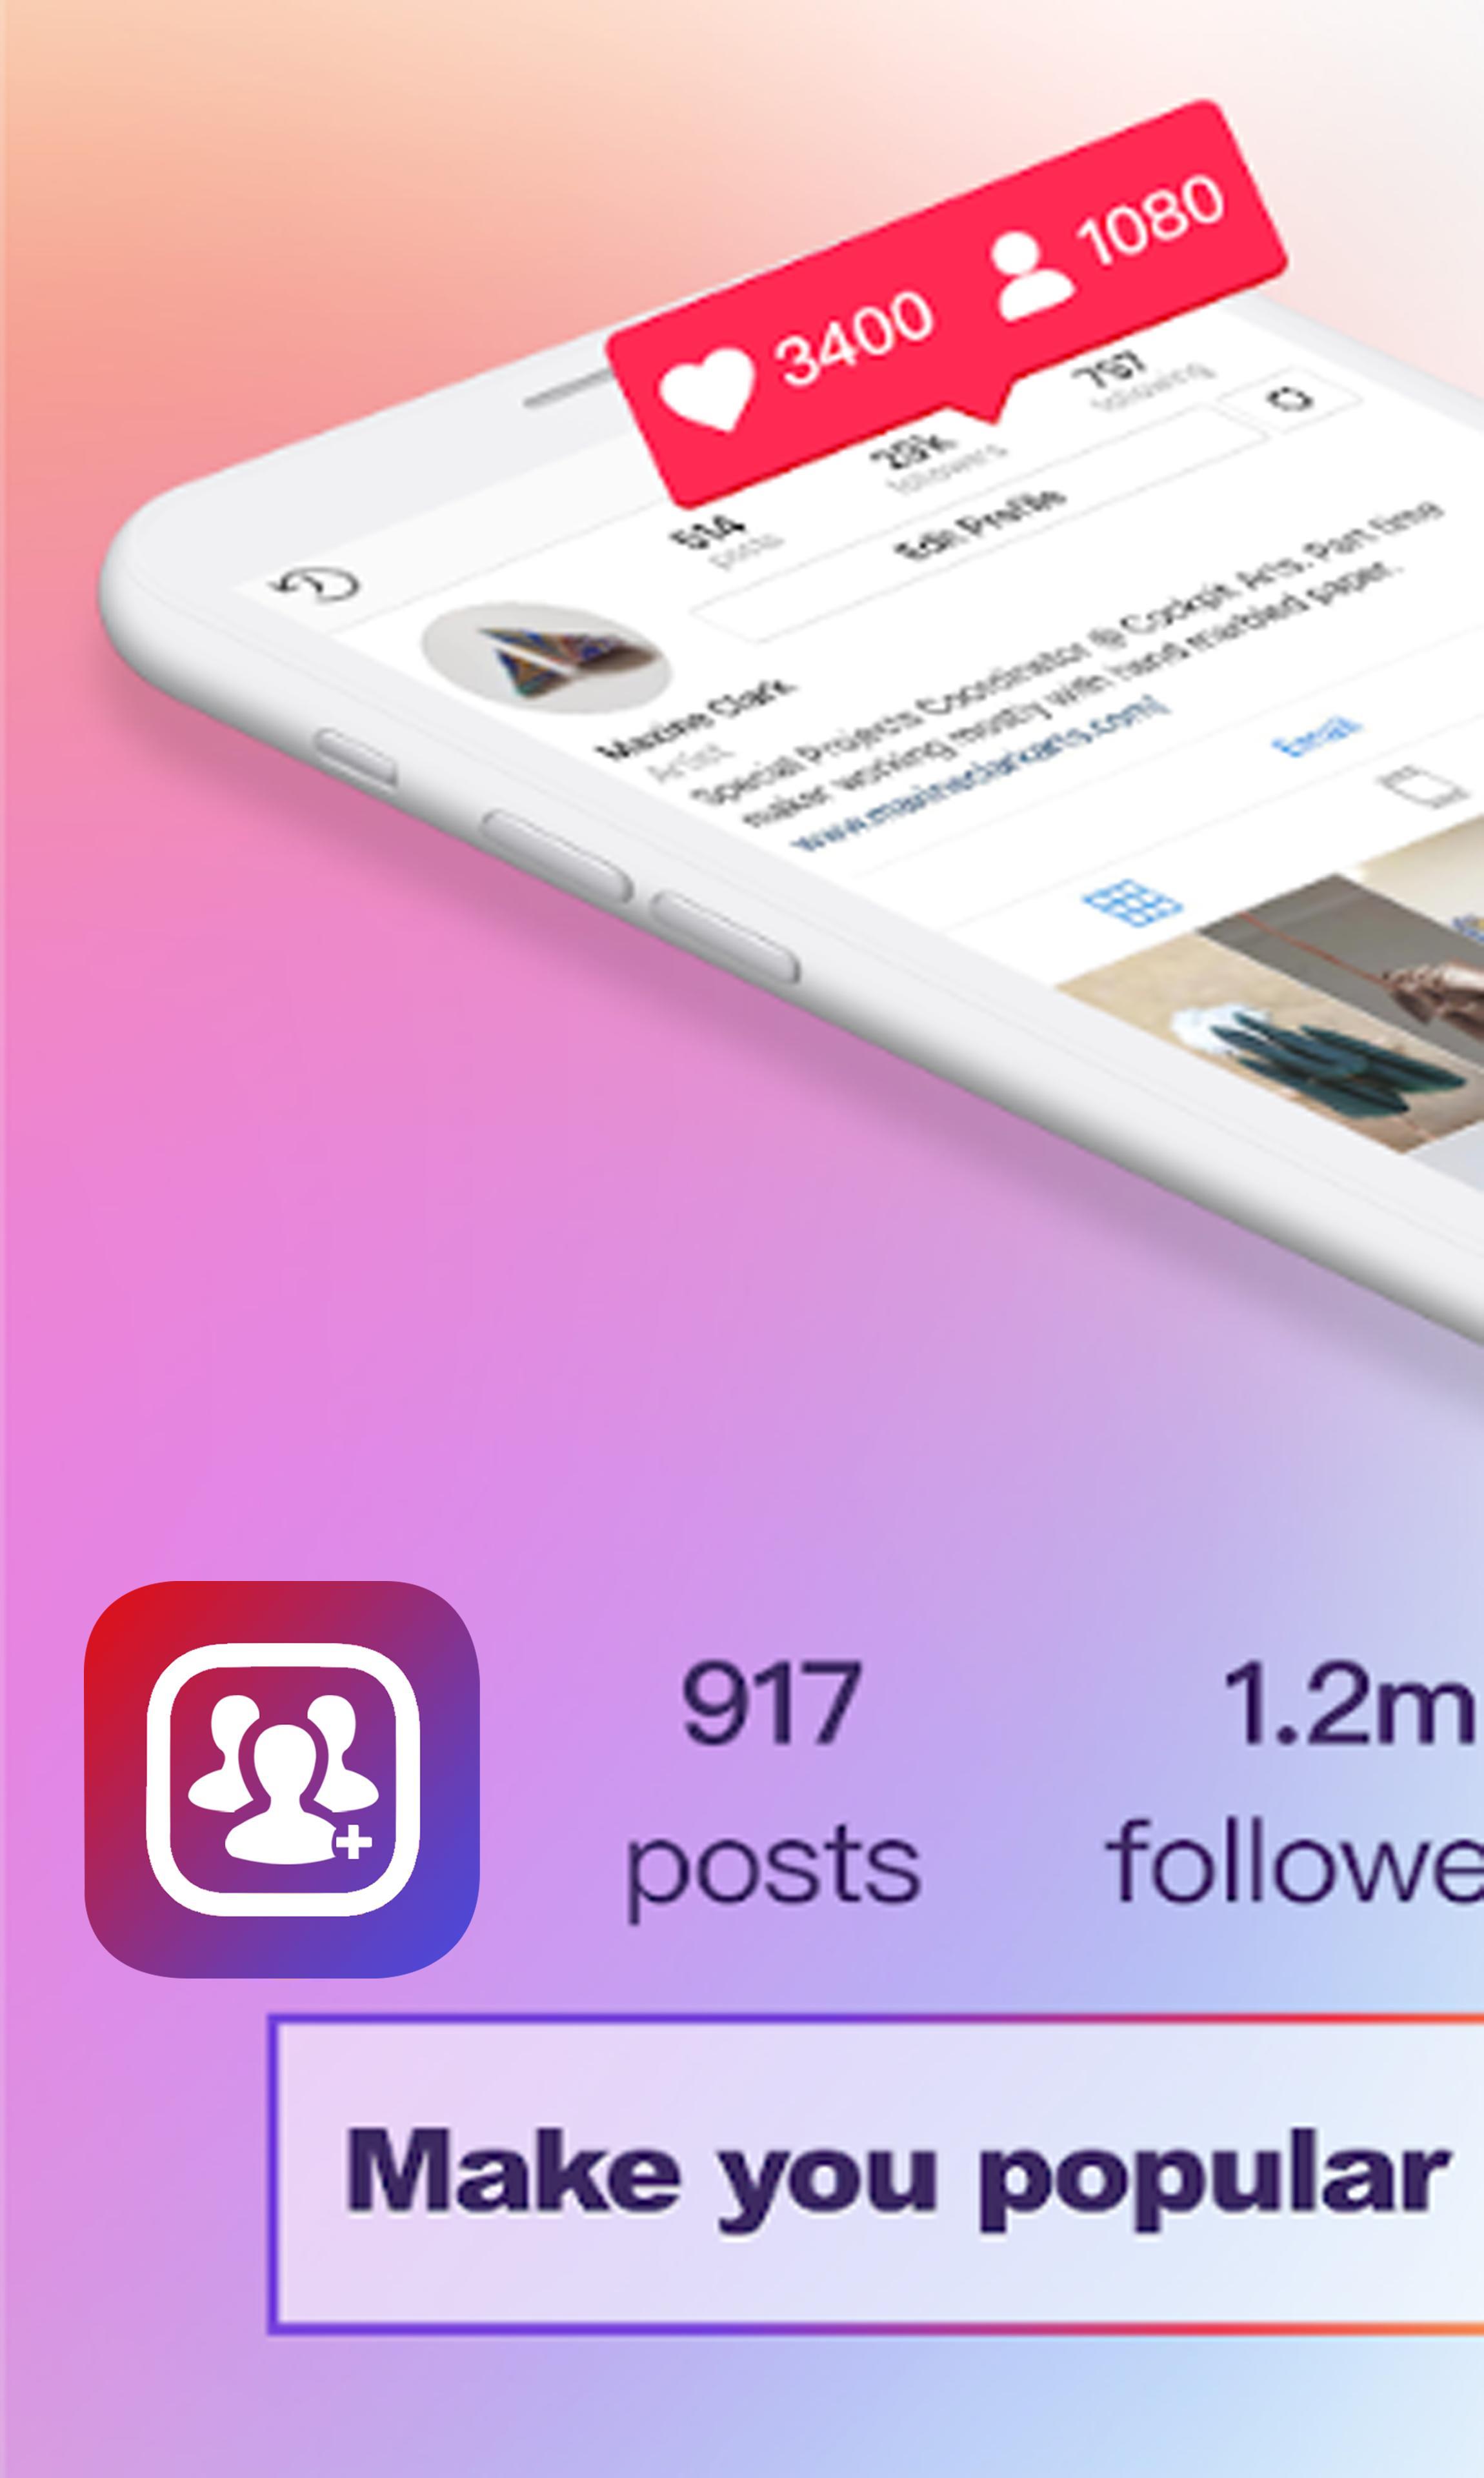 Followers For Instagram Apk 2018 - Norlako 6655 la